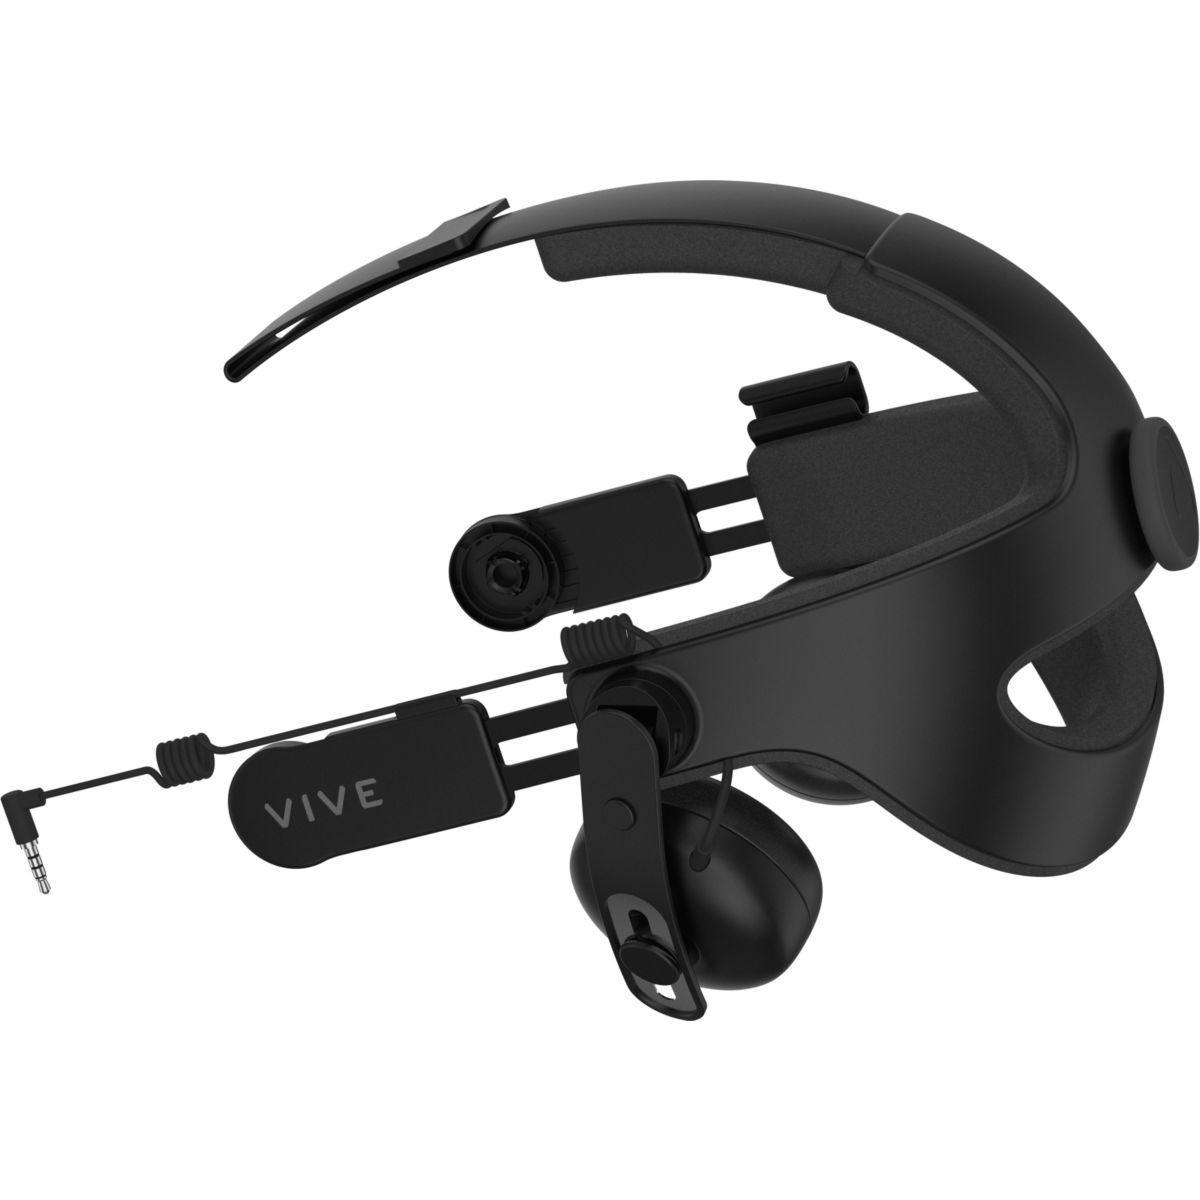 Serre t�te htc deluxe audio headstrap pour htc vive - livraison offerte : code liv (photo)